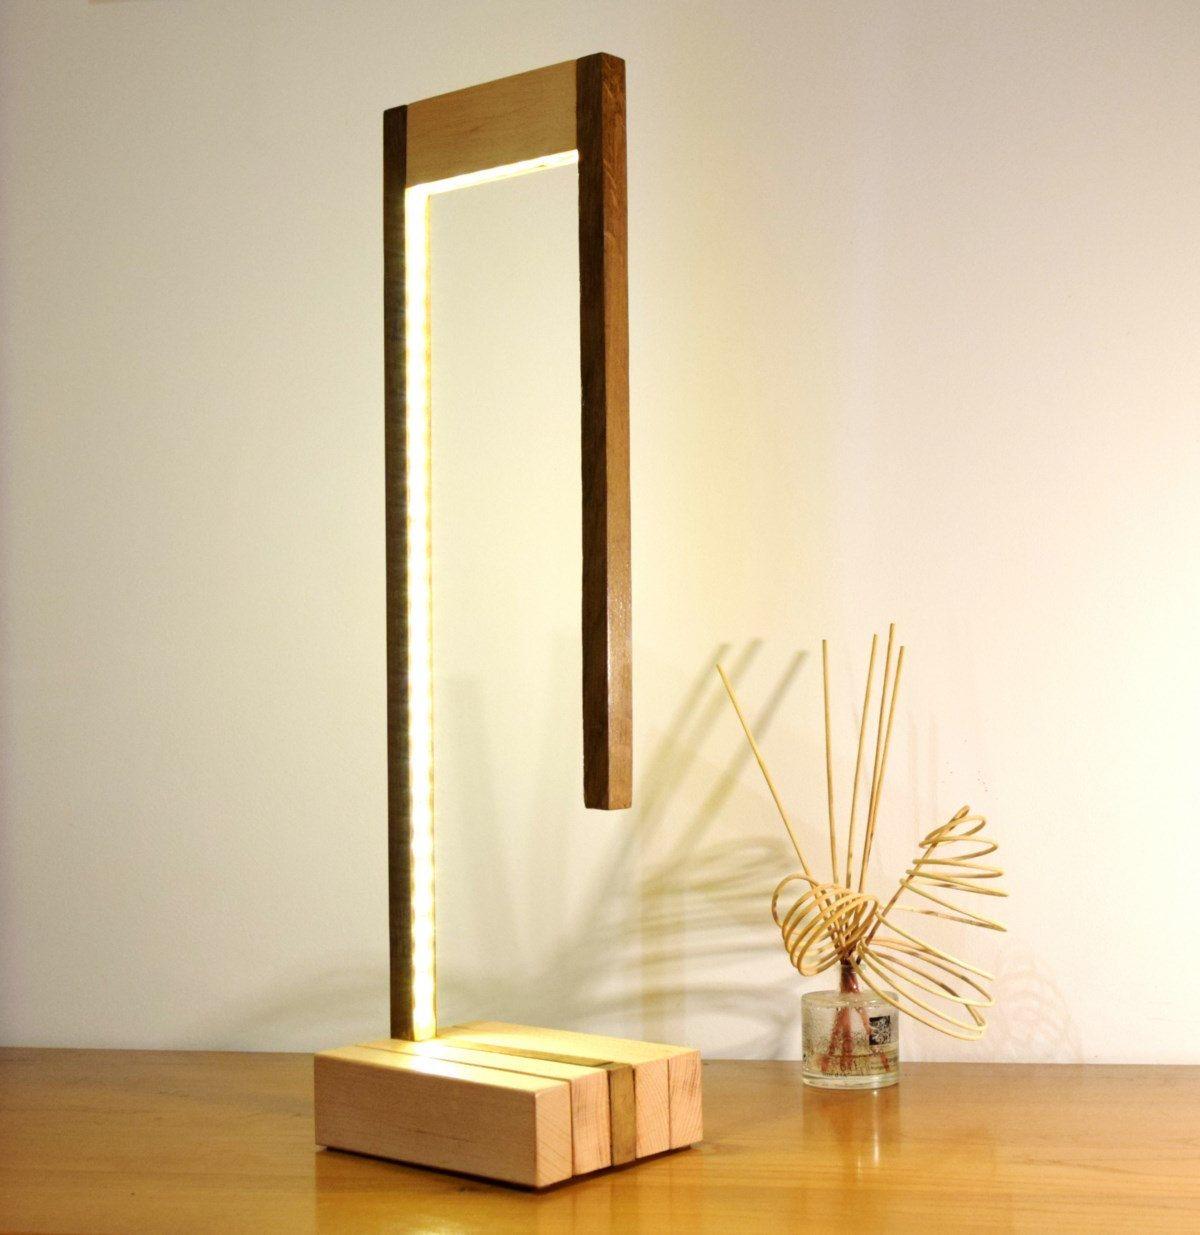 Lampe Design Lampe En Bois Massif Eclairage Led Wuturo Avec